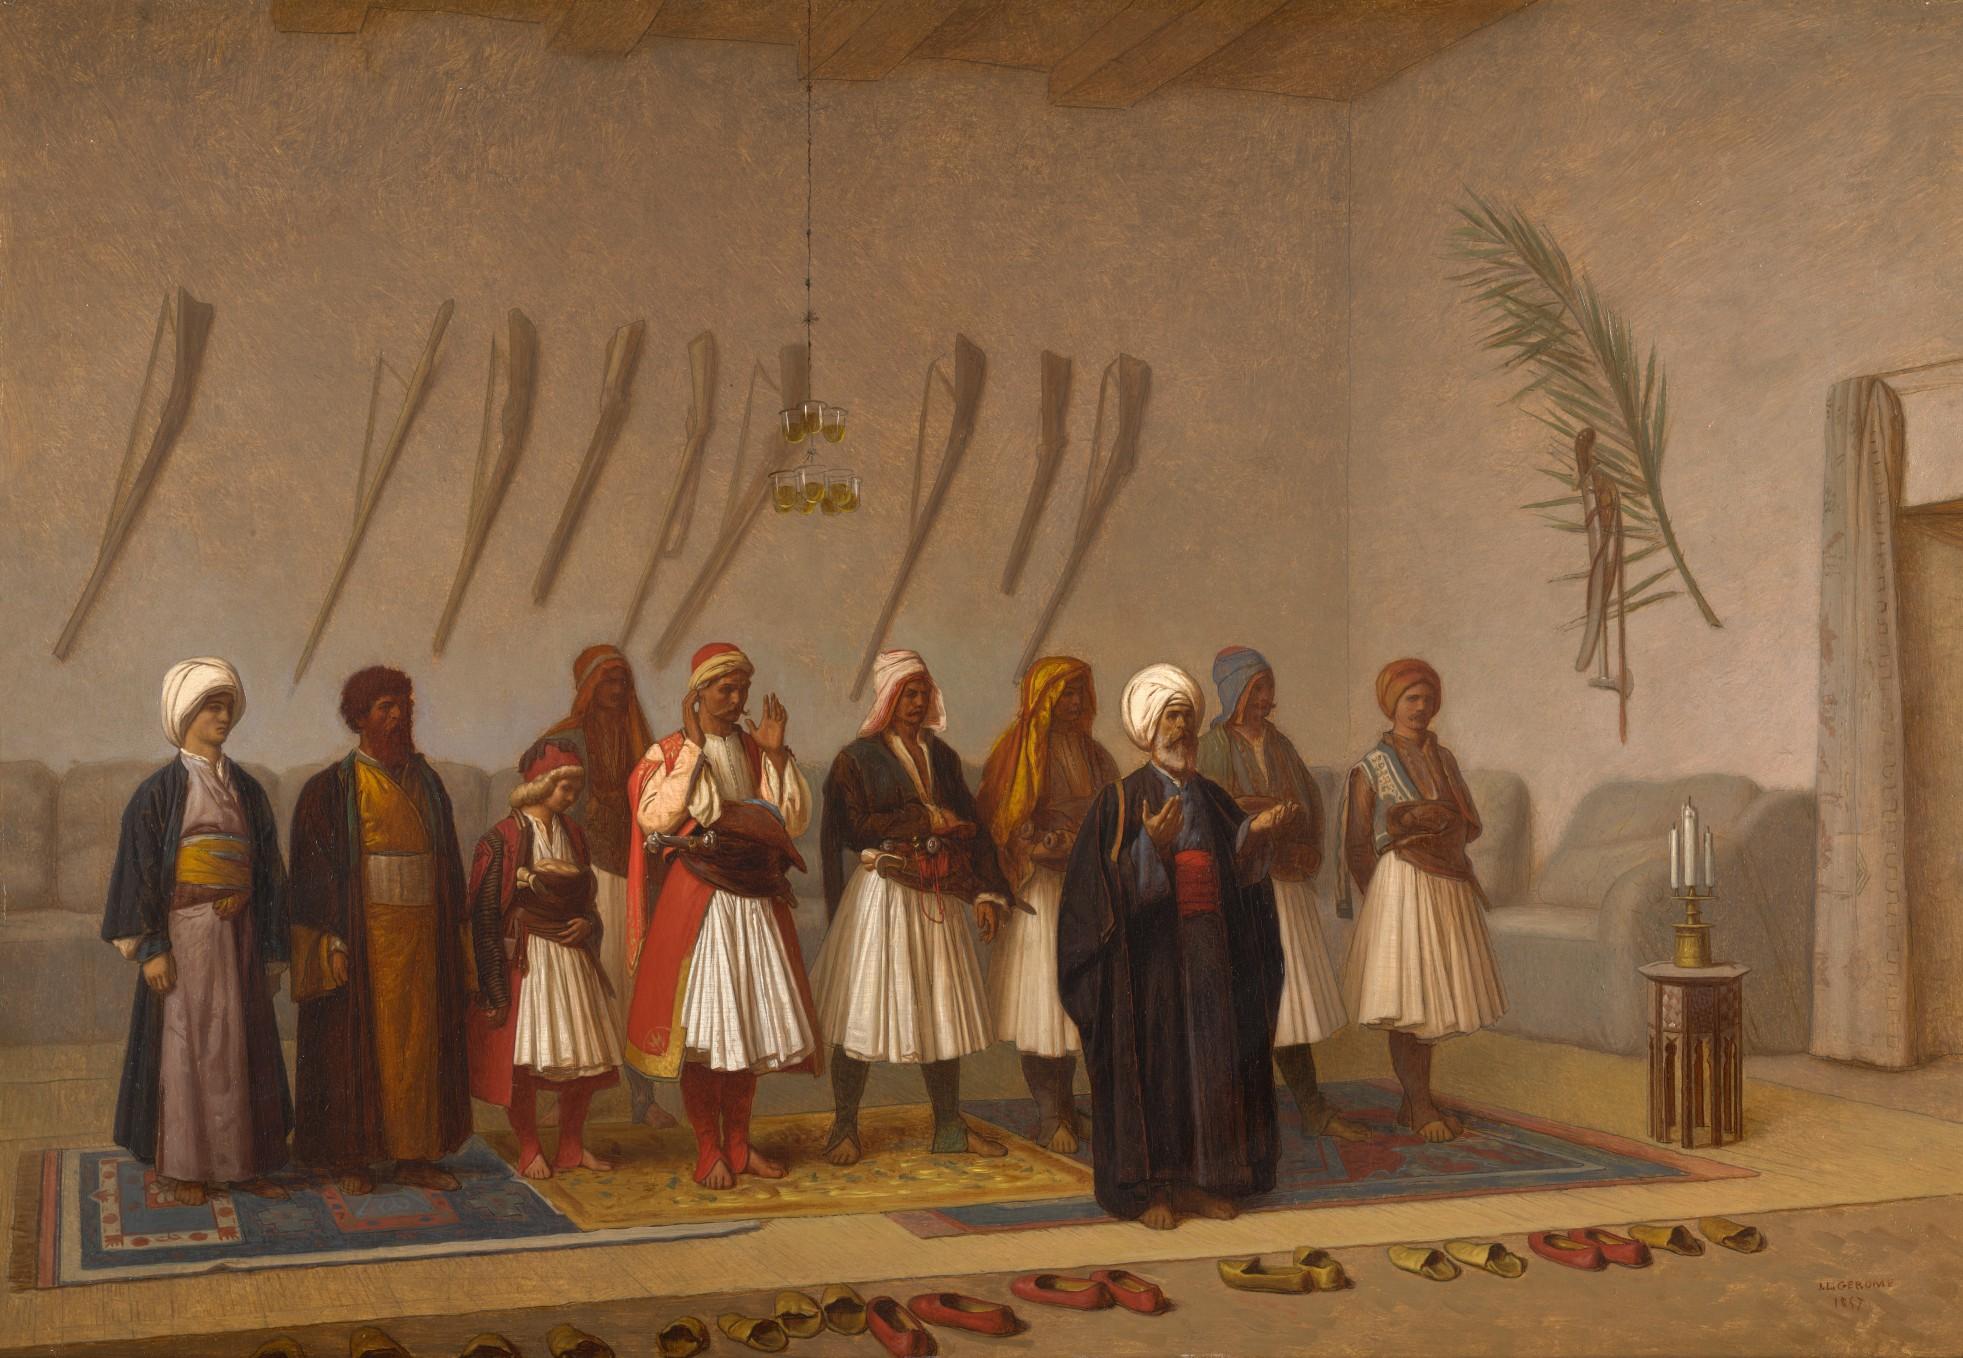 Jean-Léon Gérôme   Prayer in the House of the Arnaut Chief, 1857